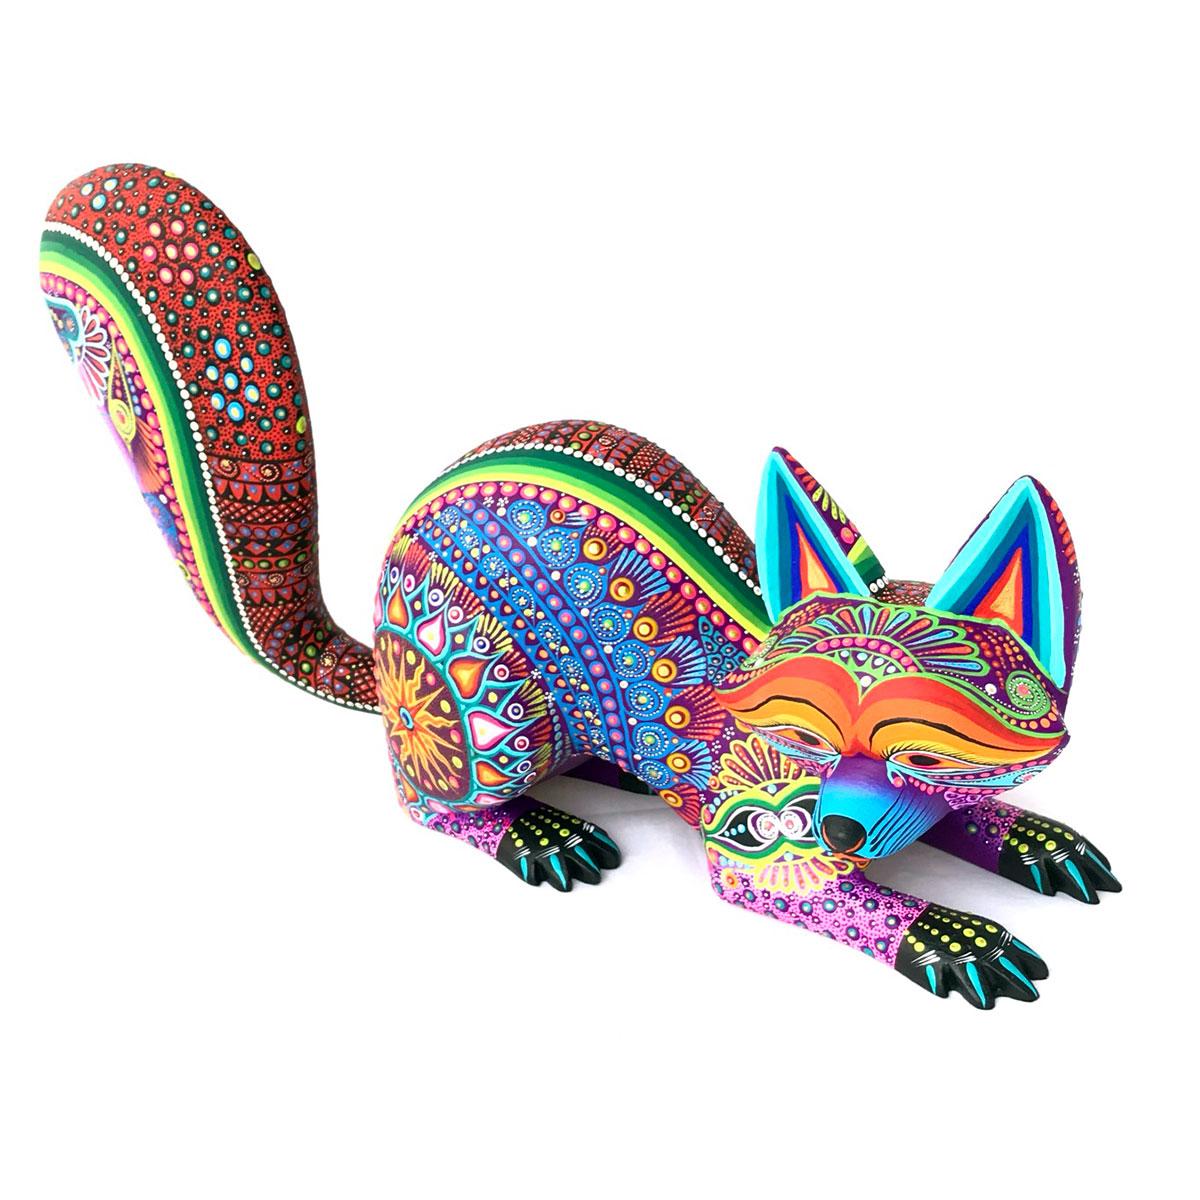 Margarita Sosa Margarita Sosa / Milagros de Copal: Colorful Raccoon raccoons